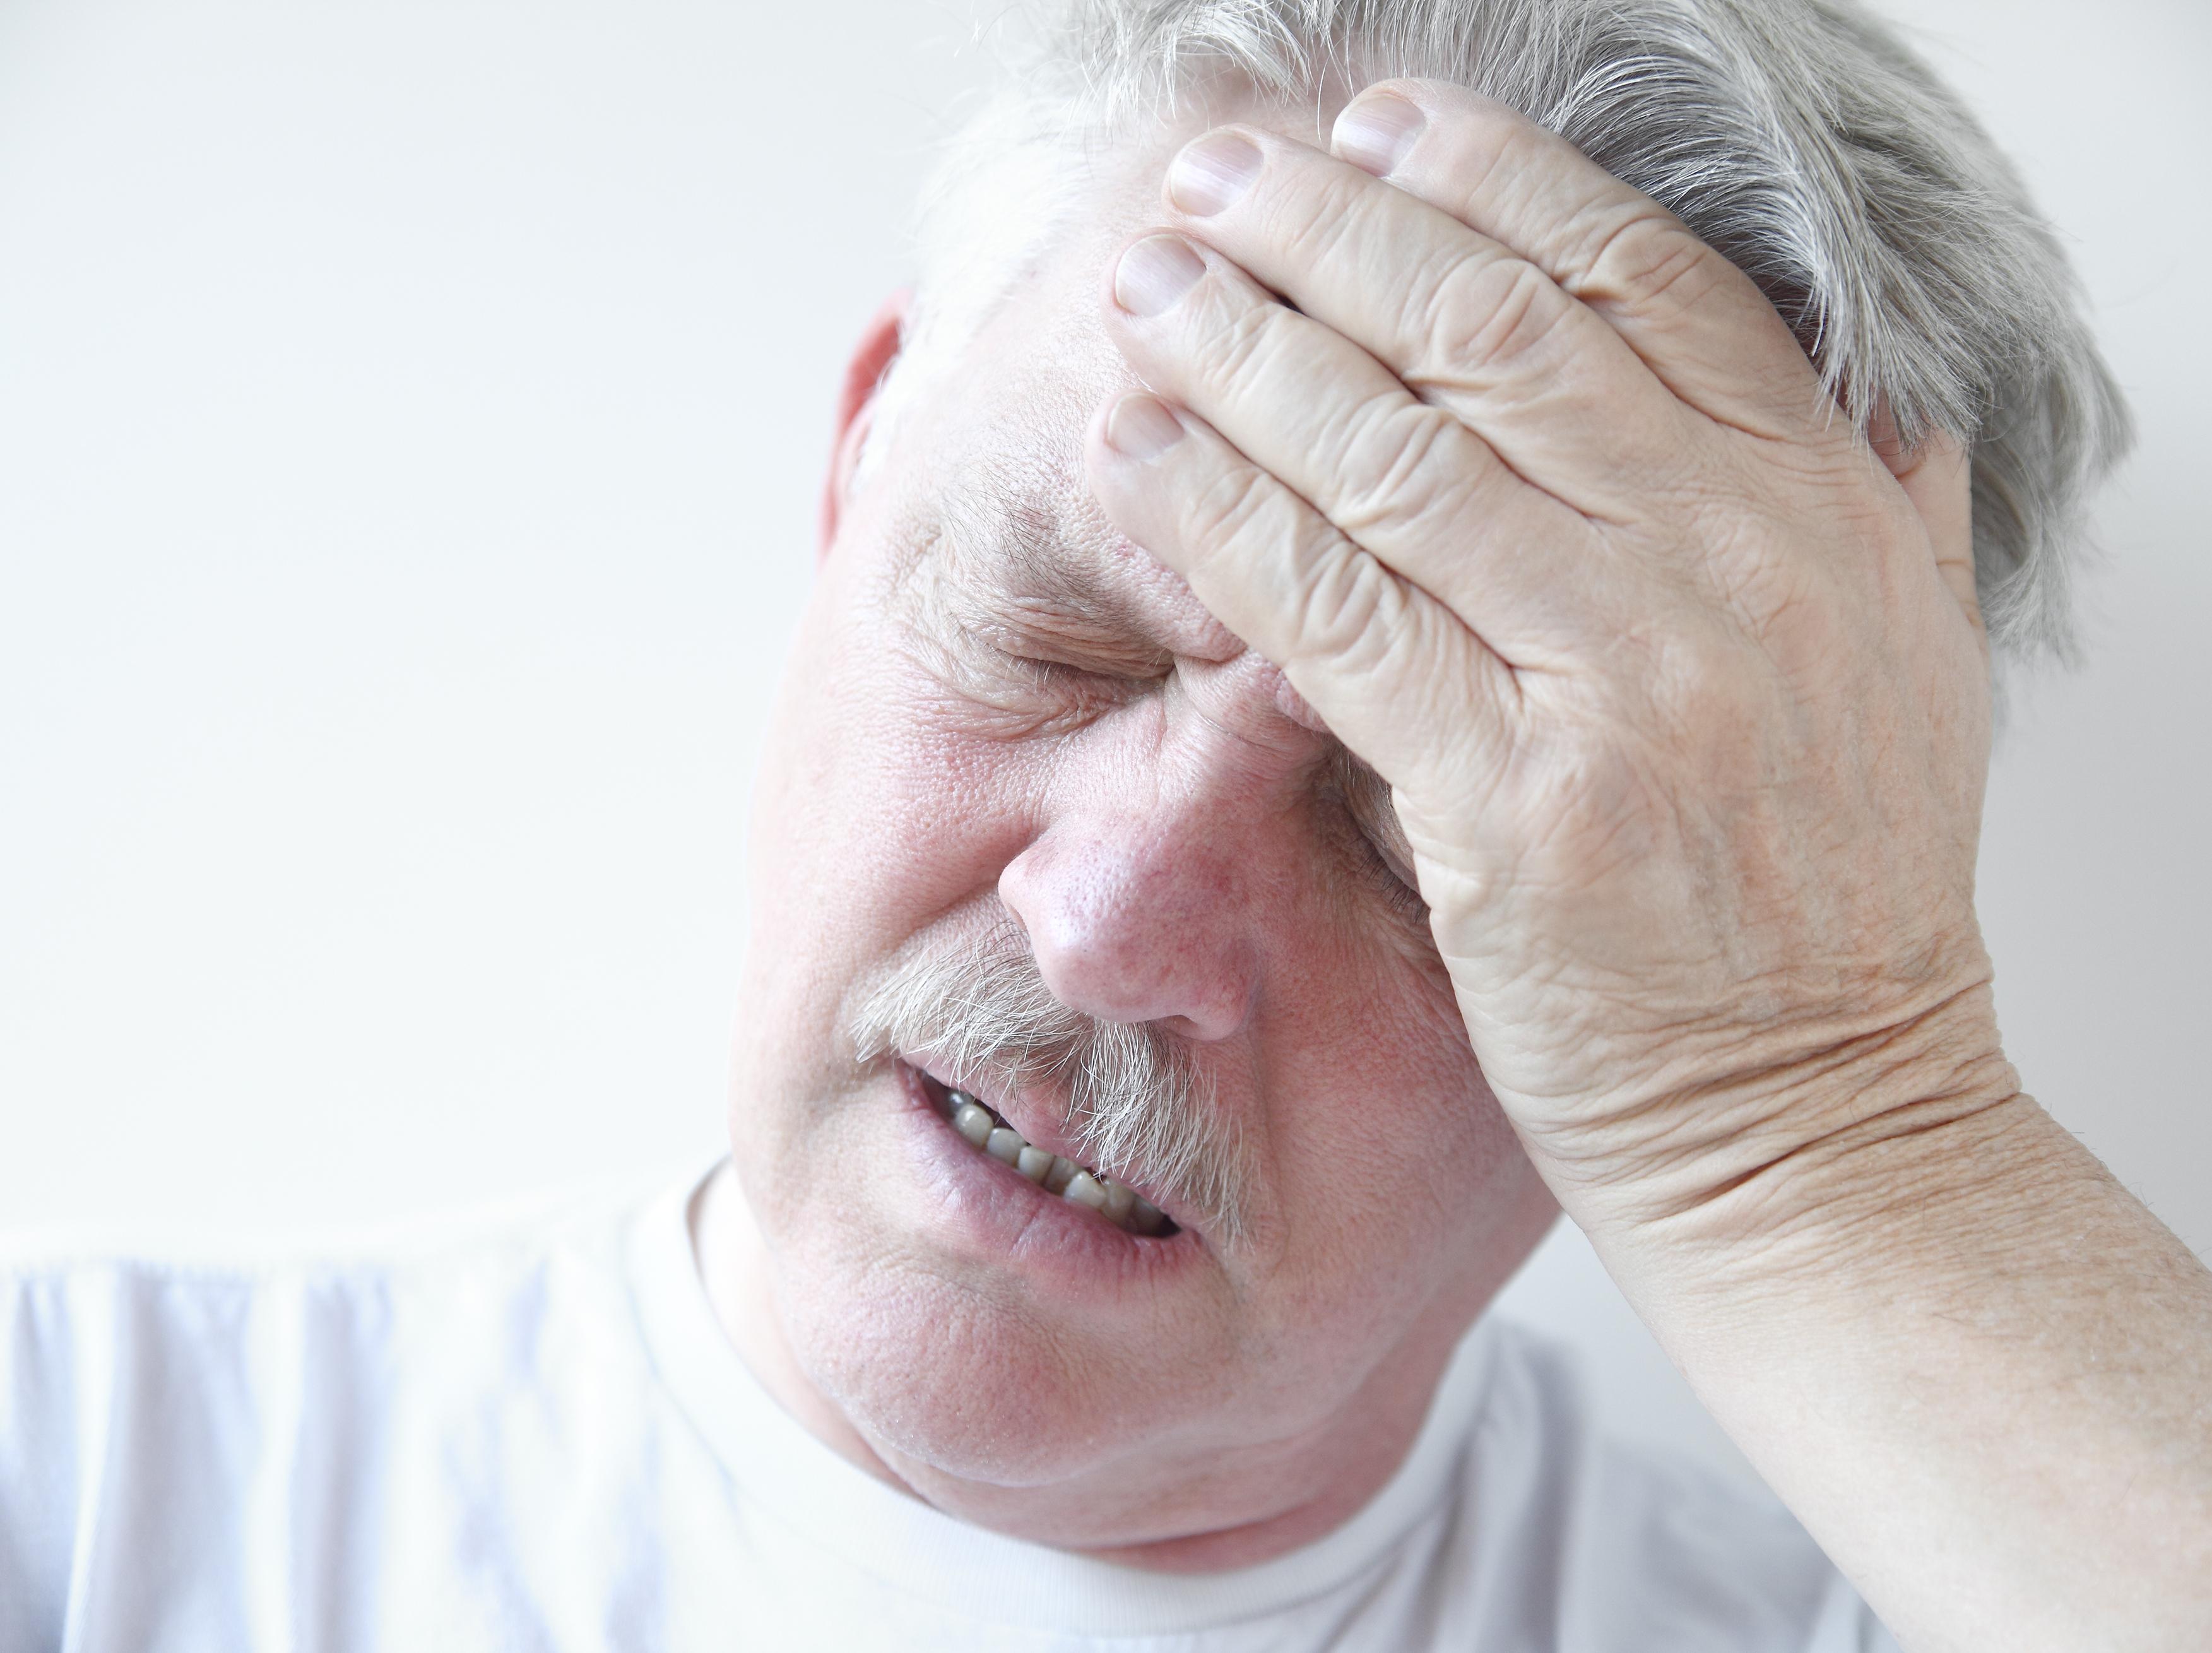 huvudvärk illamående trötthet magont